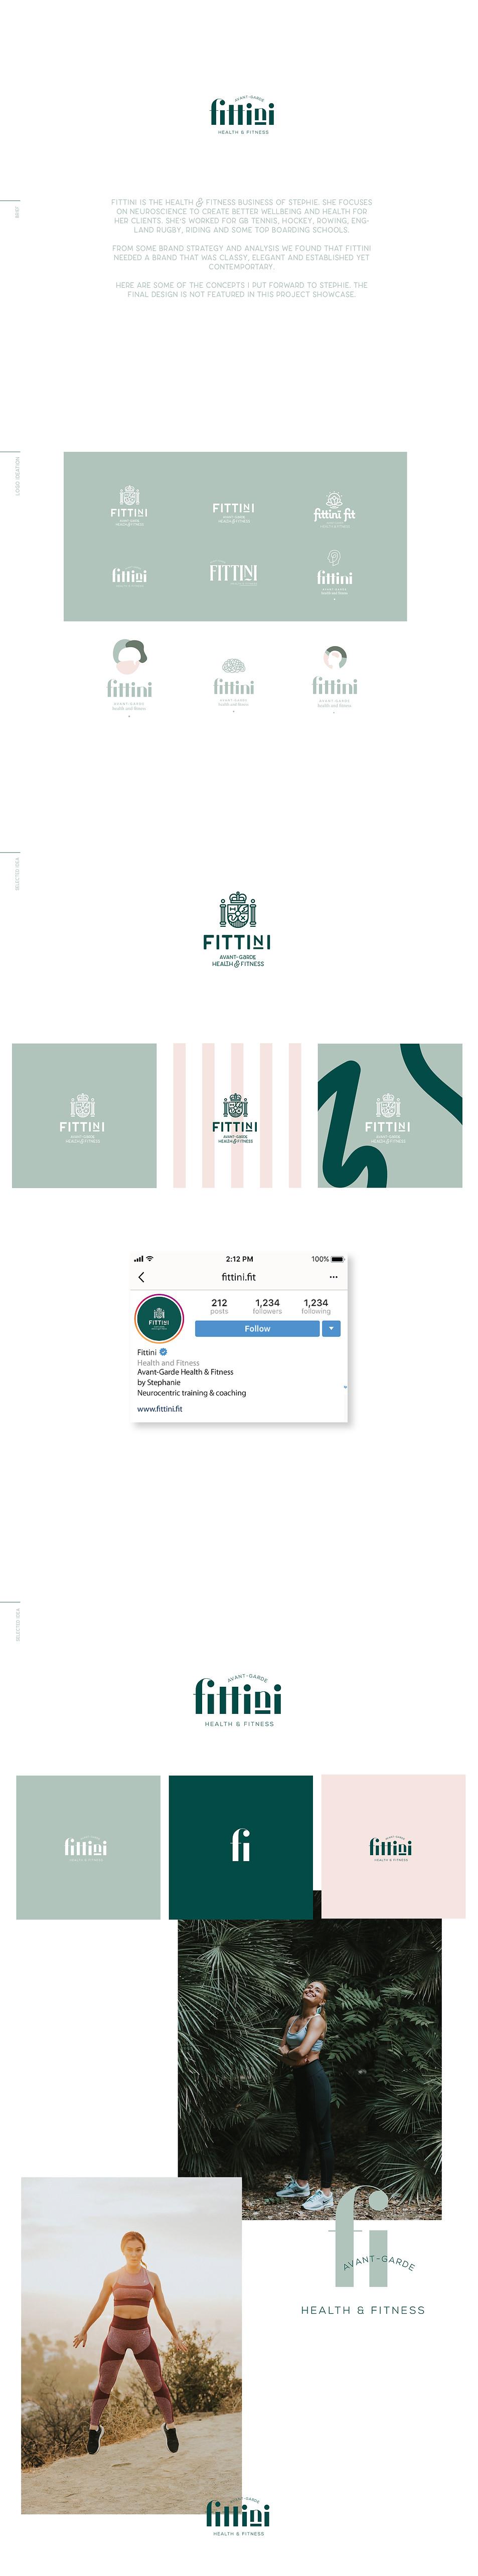 Fittini-10.jpg